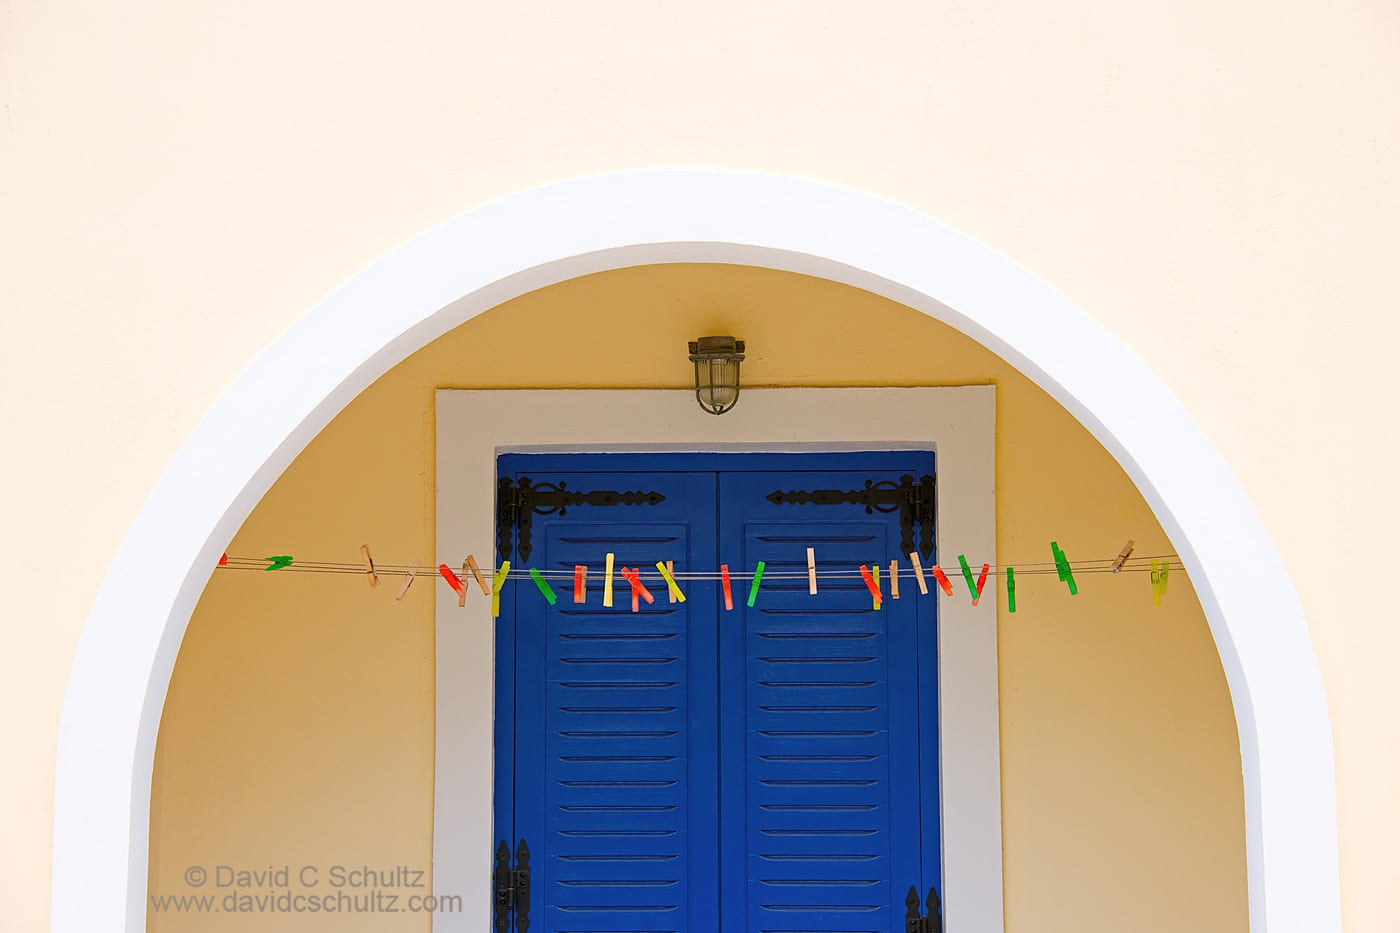 Oia, Santorini, Greece - Image #202-234